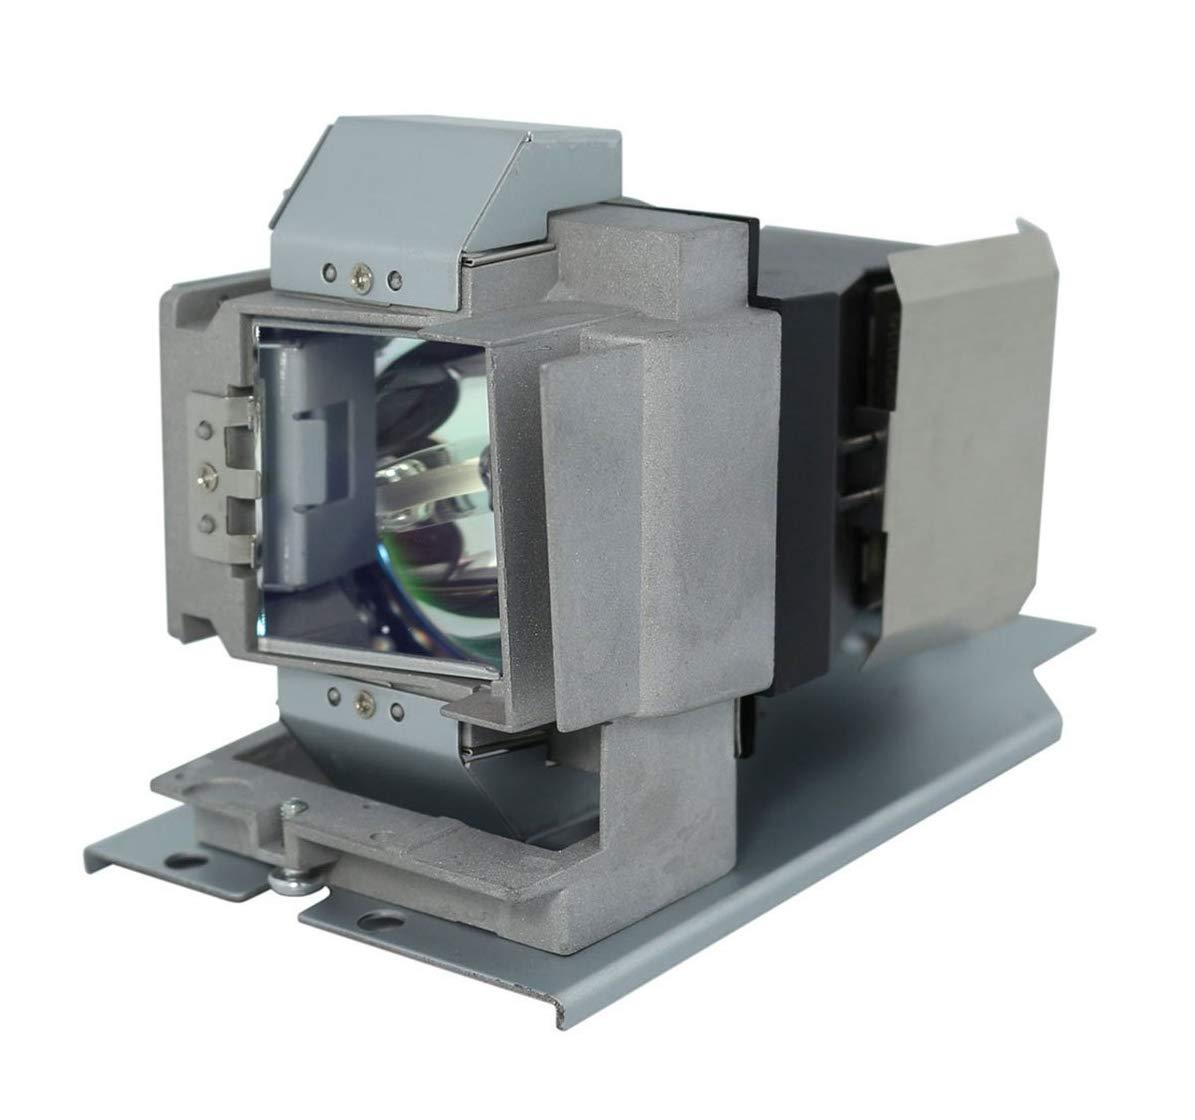 GOLDENRIVER 5J.J5405.001 オリジナルプロジェクターランプ ハウジング付き BENQ EP5920 W1060+ W700 W700+ W703D W703Dに対応 B07MQD78VV